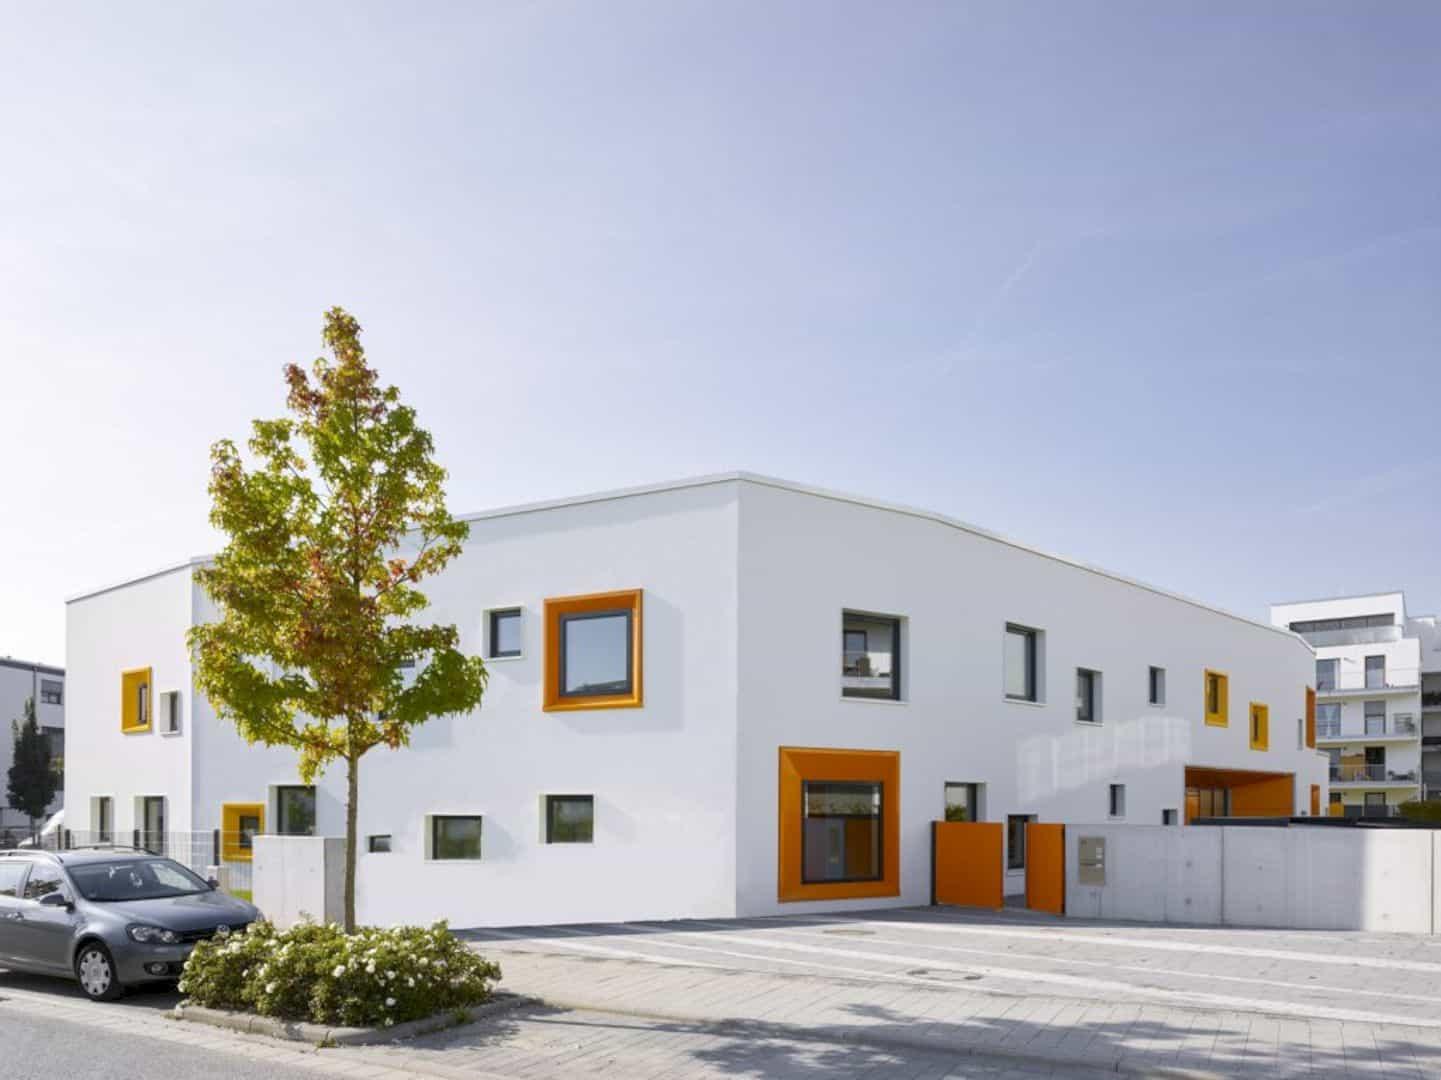 Koenigsblick Kindergarten A Childcare Center Incorporating Park Concept 4